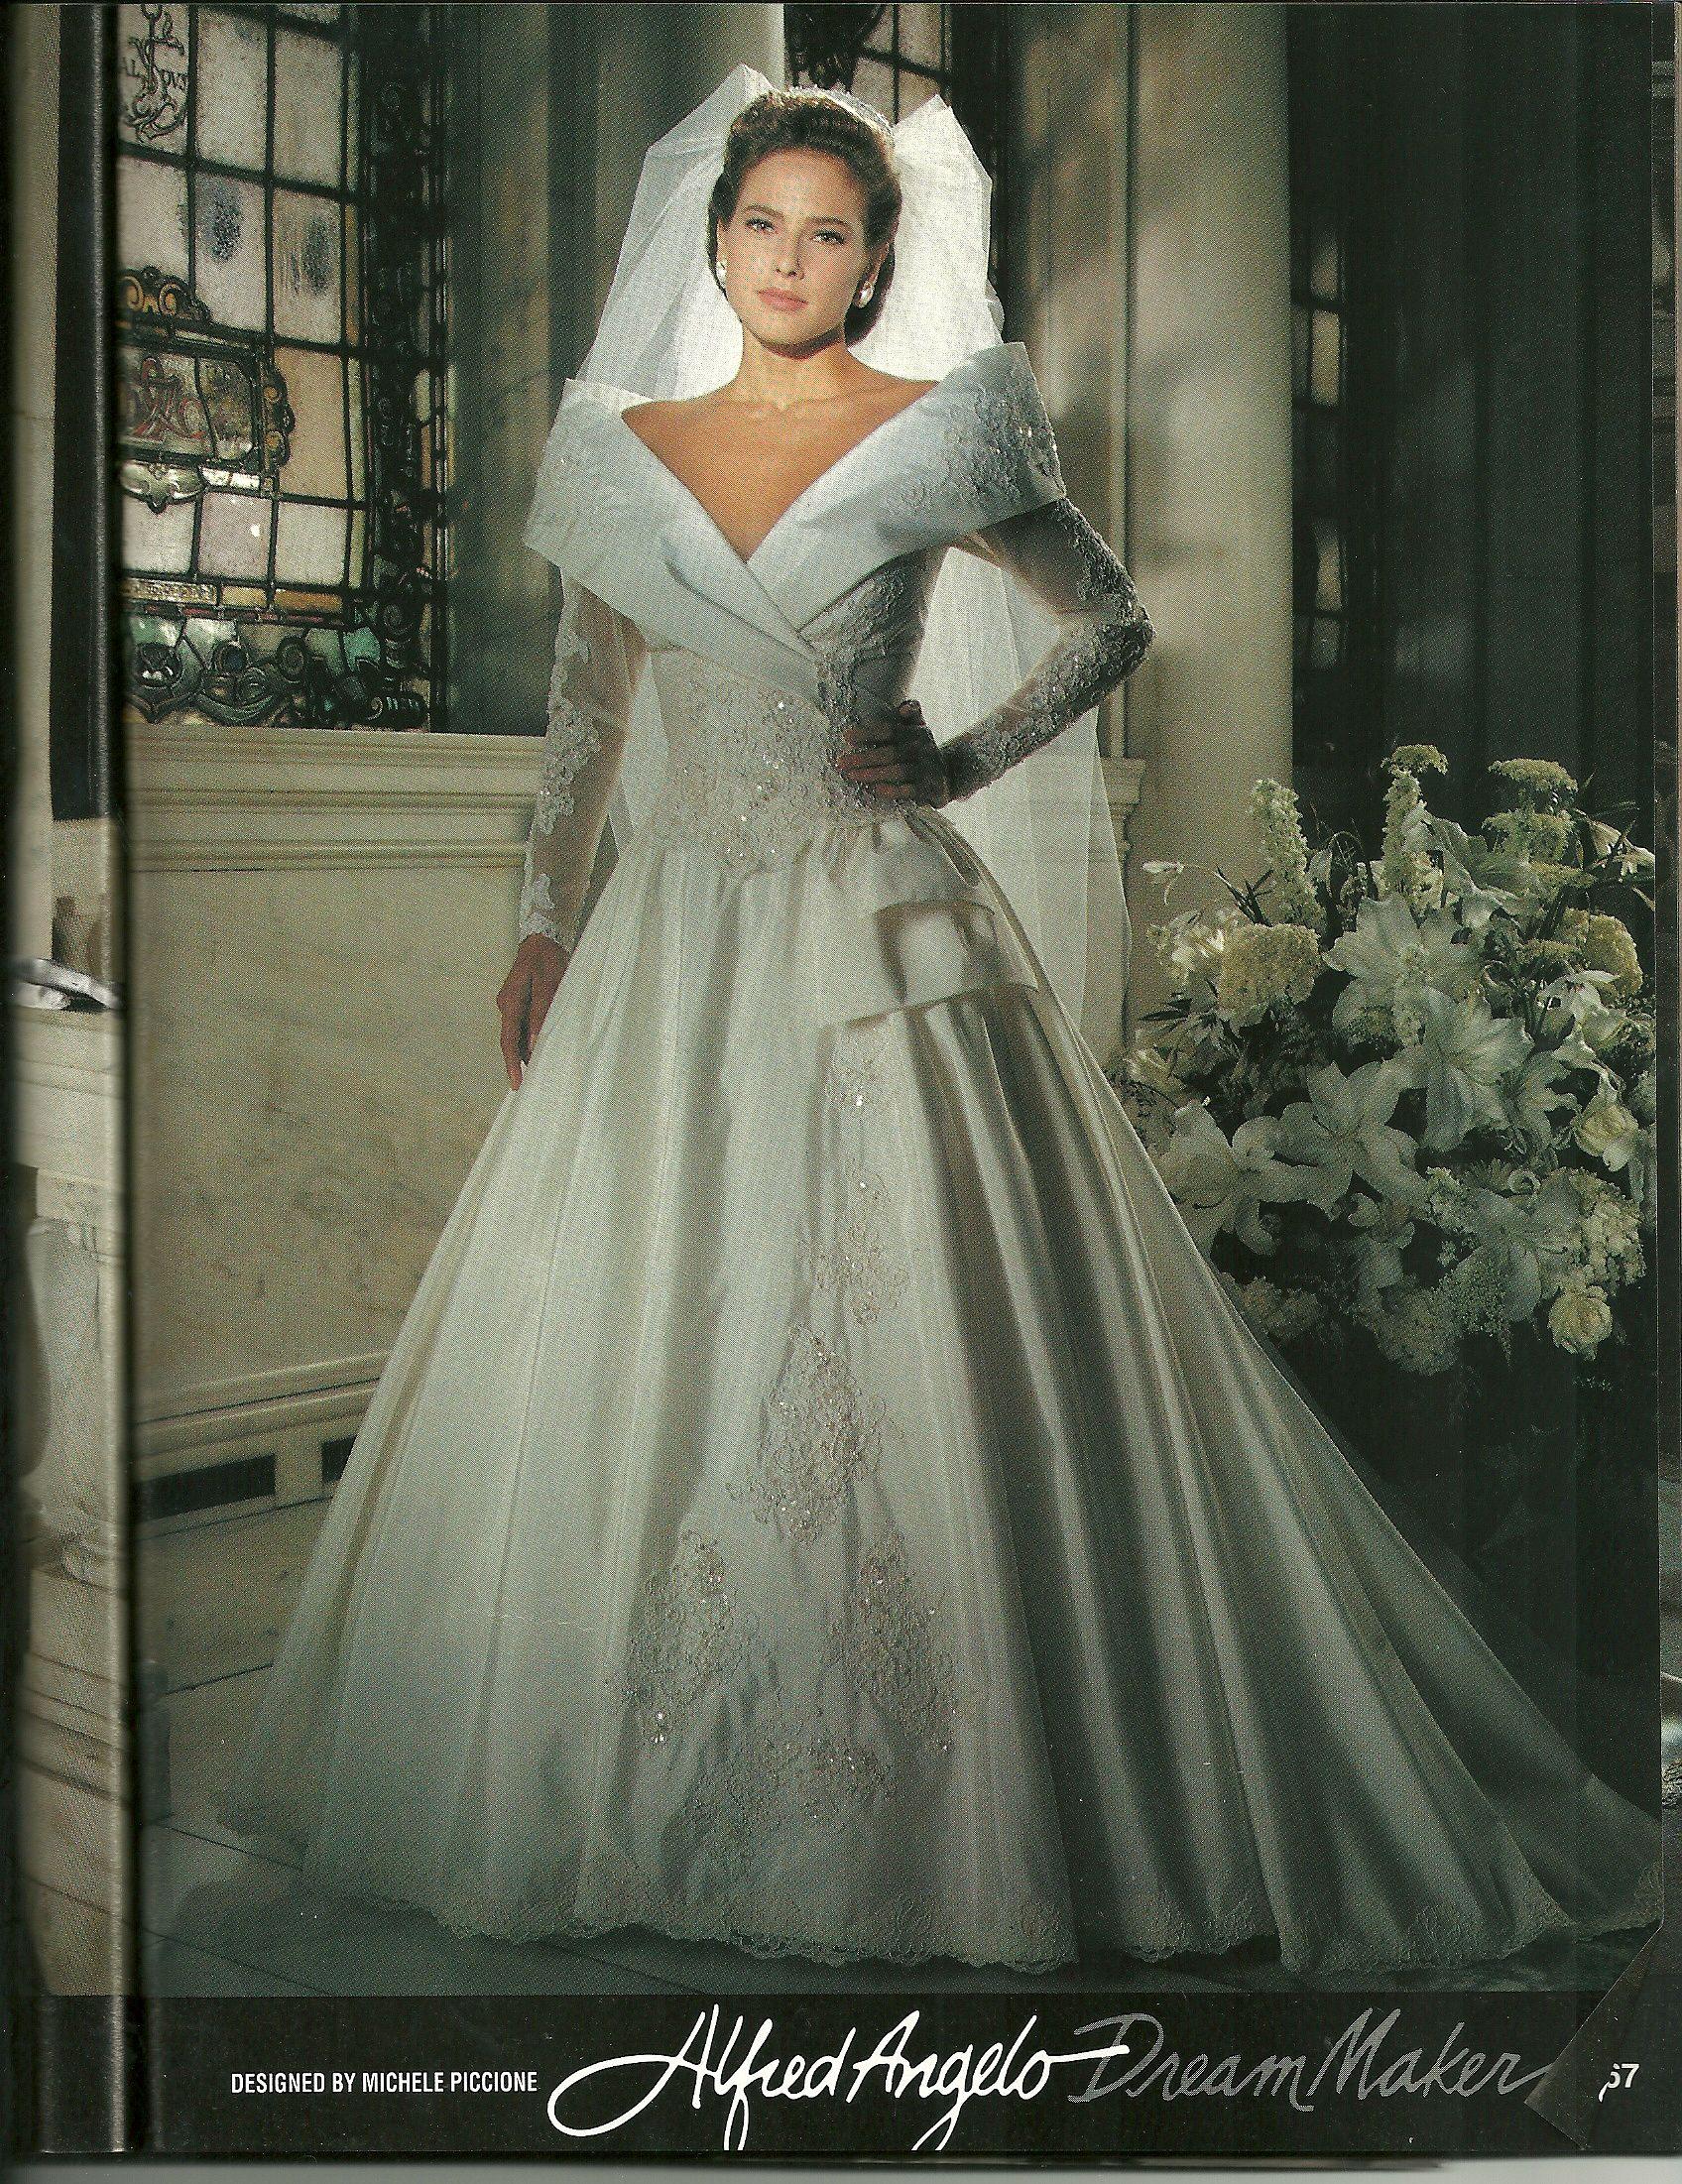 Celebrity Wedding Dresses 1990s : Designer wedding dresses bridal gown winter weddings